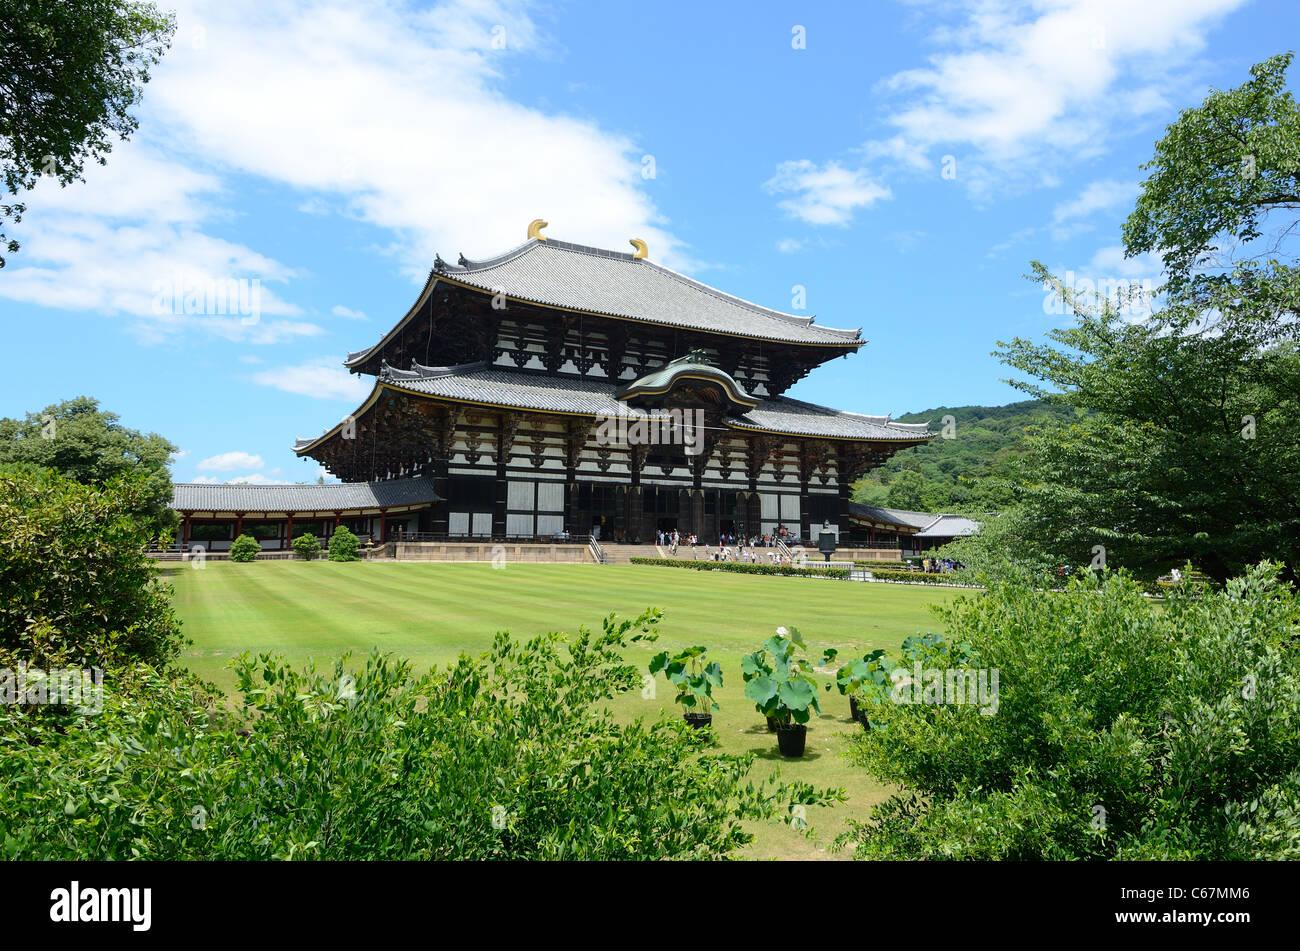 Todai-ji Buddhist Temple in Nara, Japan. - Stock Image